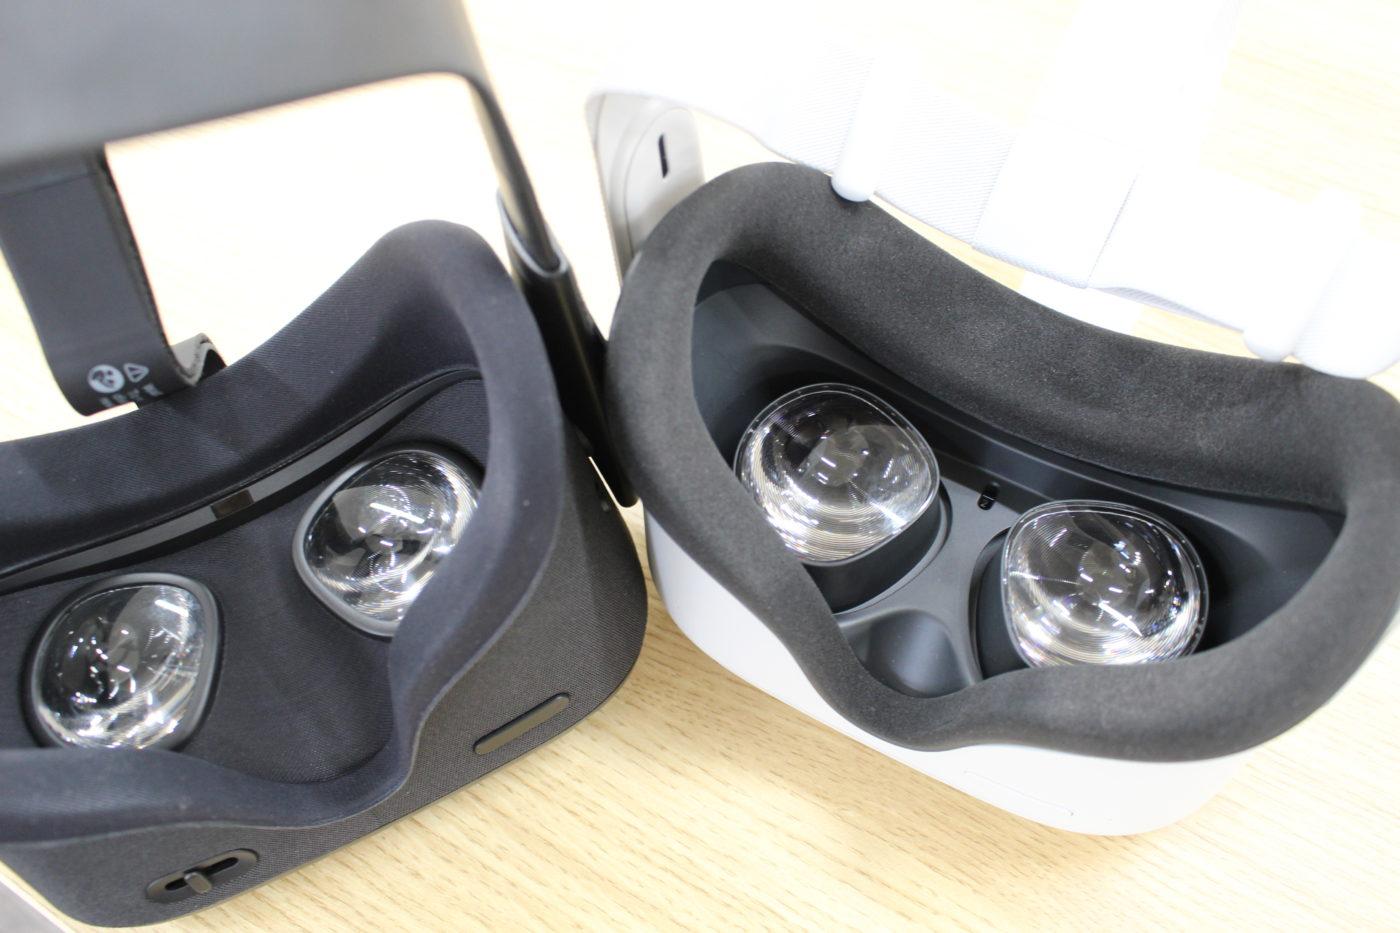 Oculus Questとレンズを比較